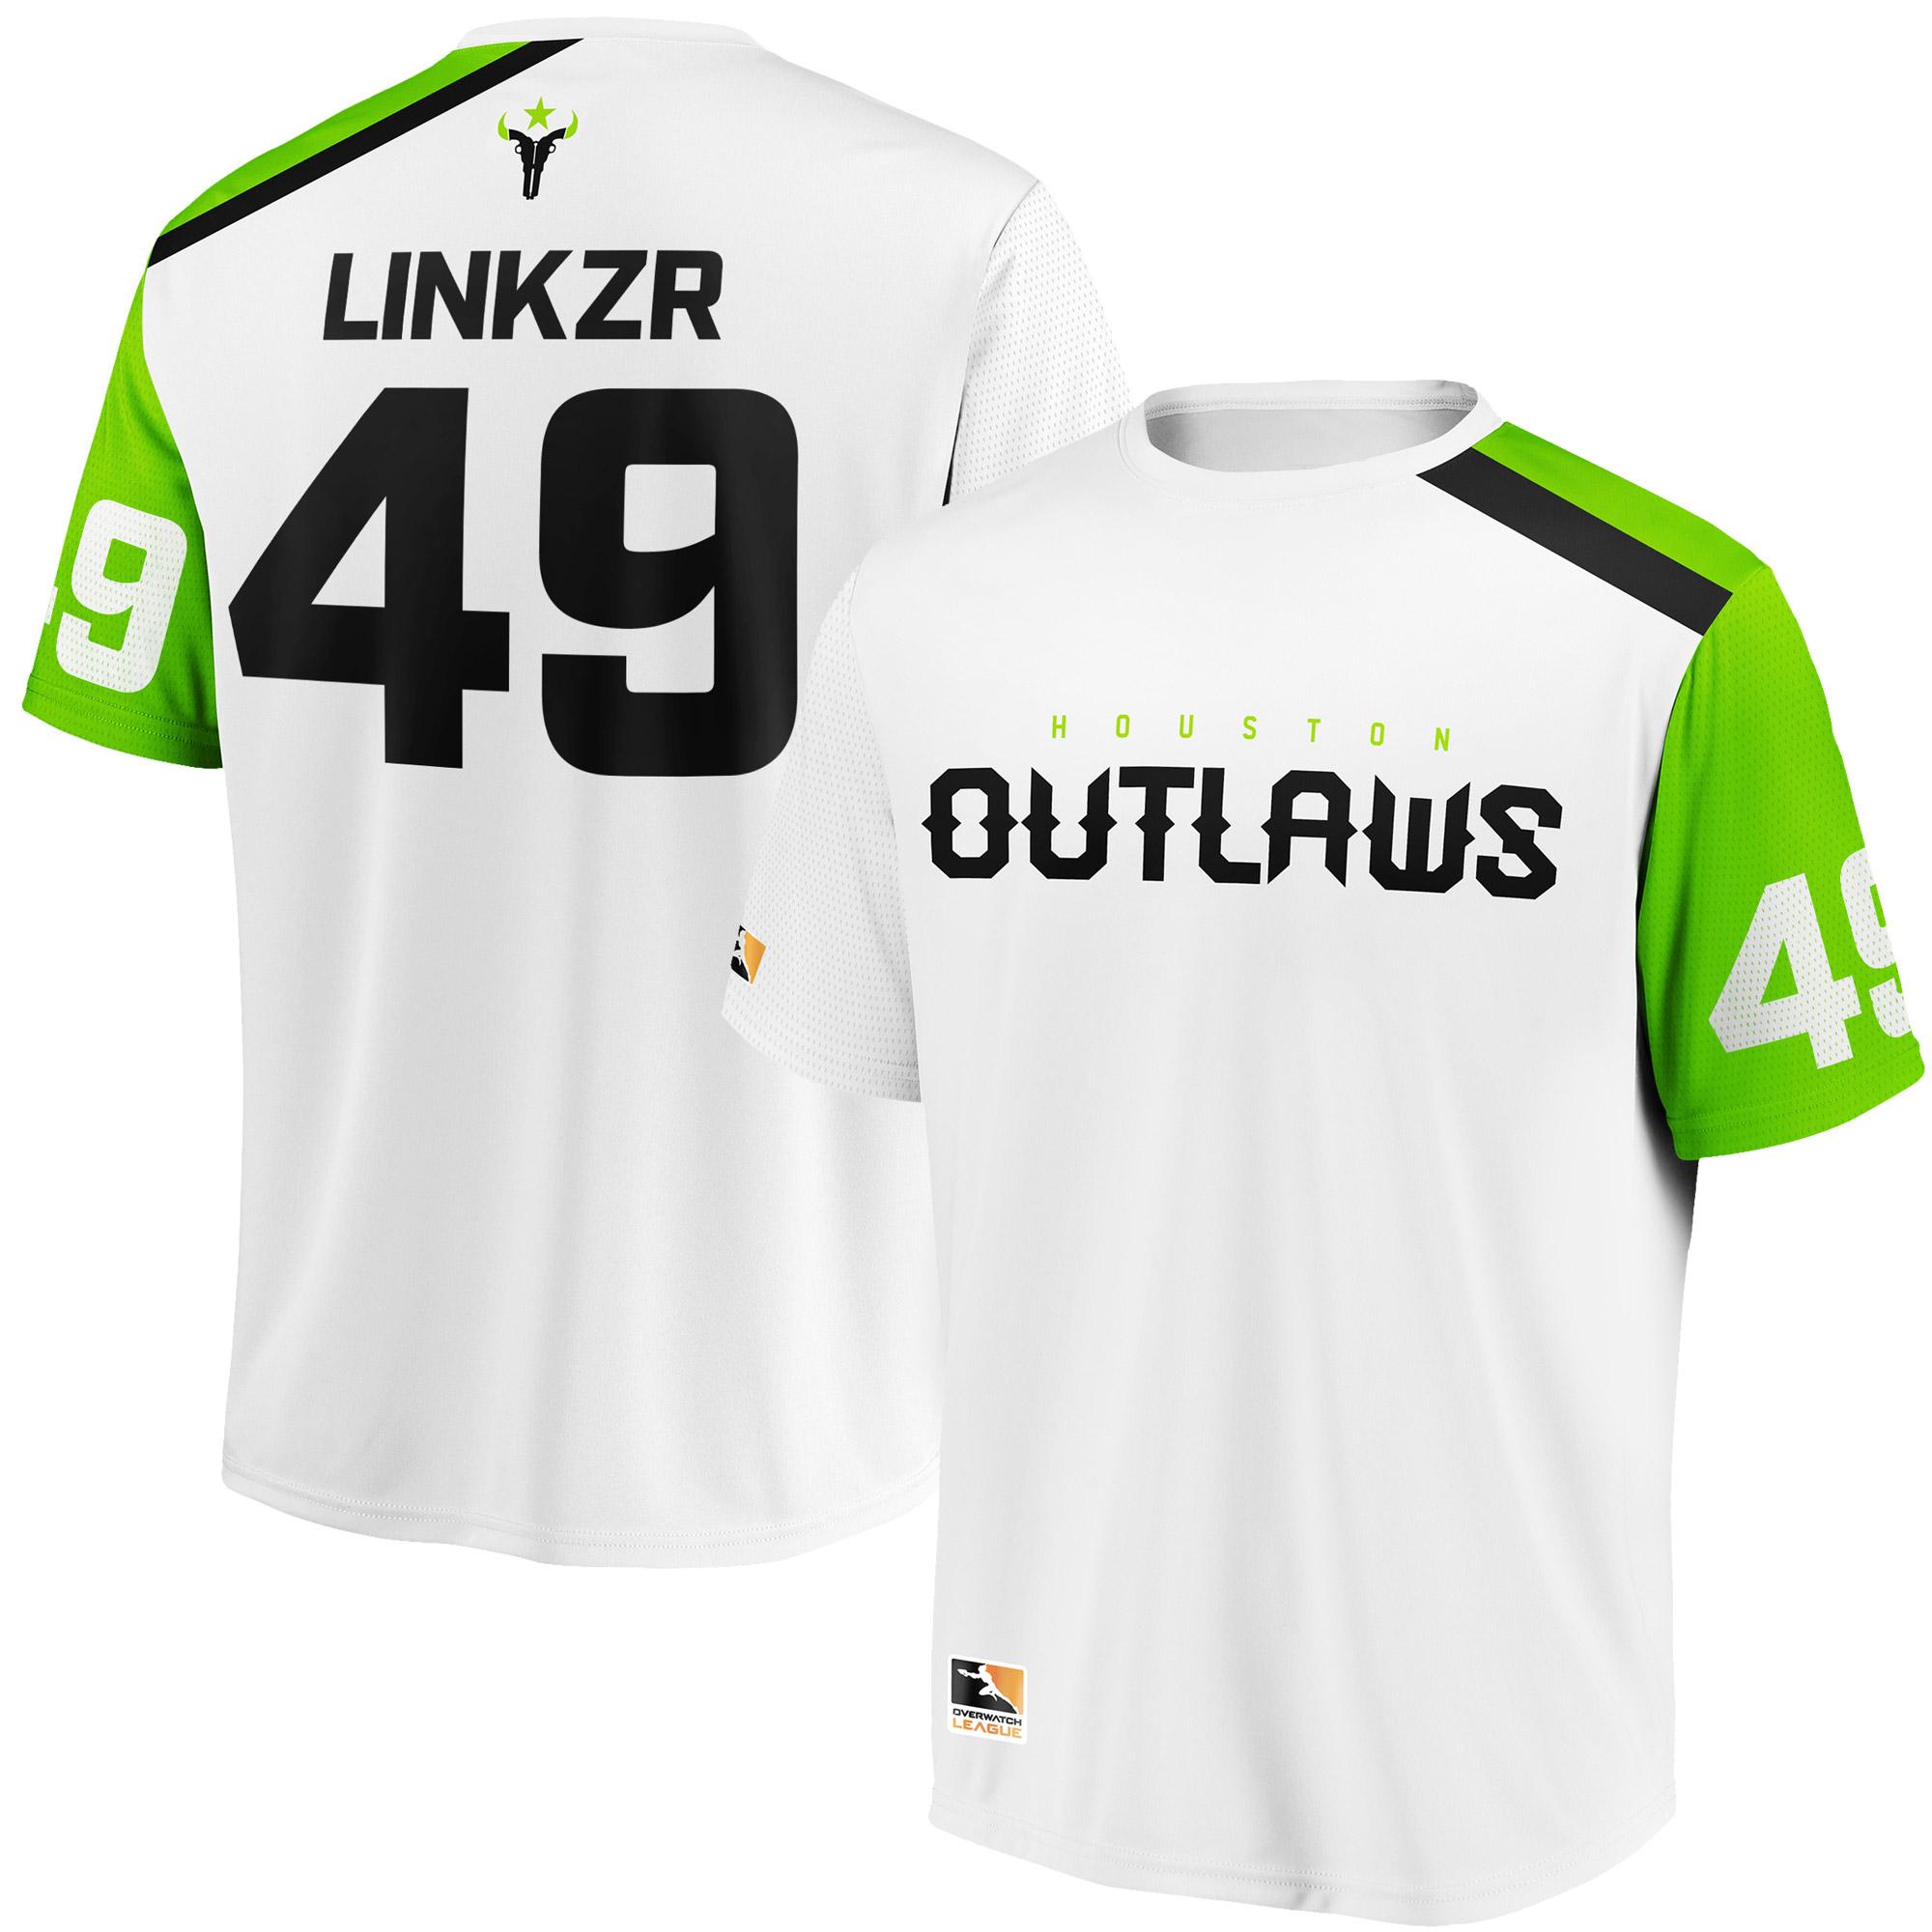 LiNkzr Houston Outlaws Overwatch League Replica Away Jersey - White